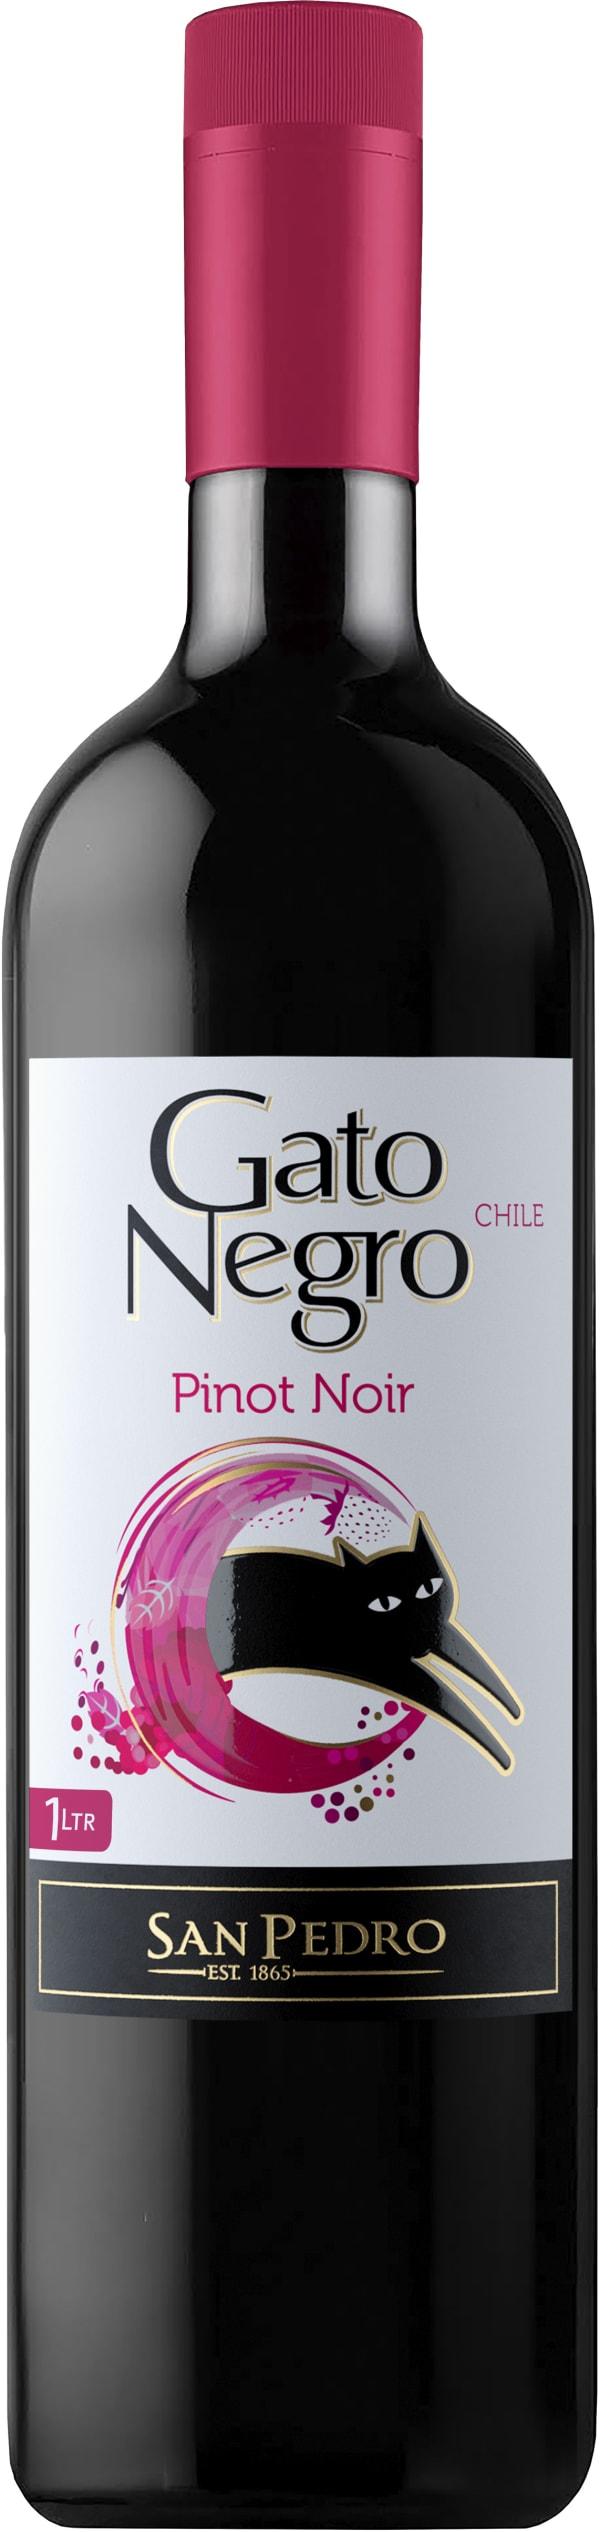 Gato Negro Pinot Noir 2018 plastflaska